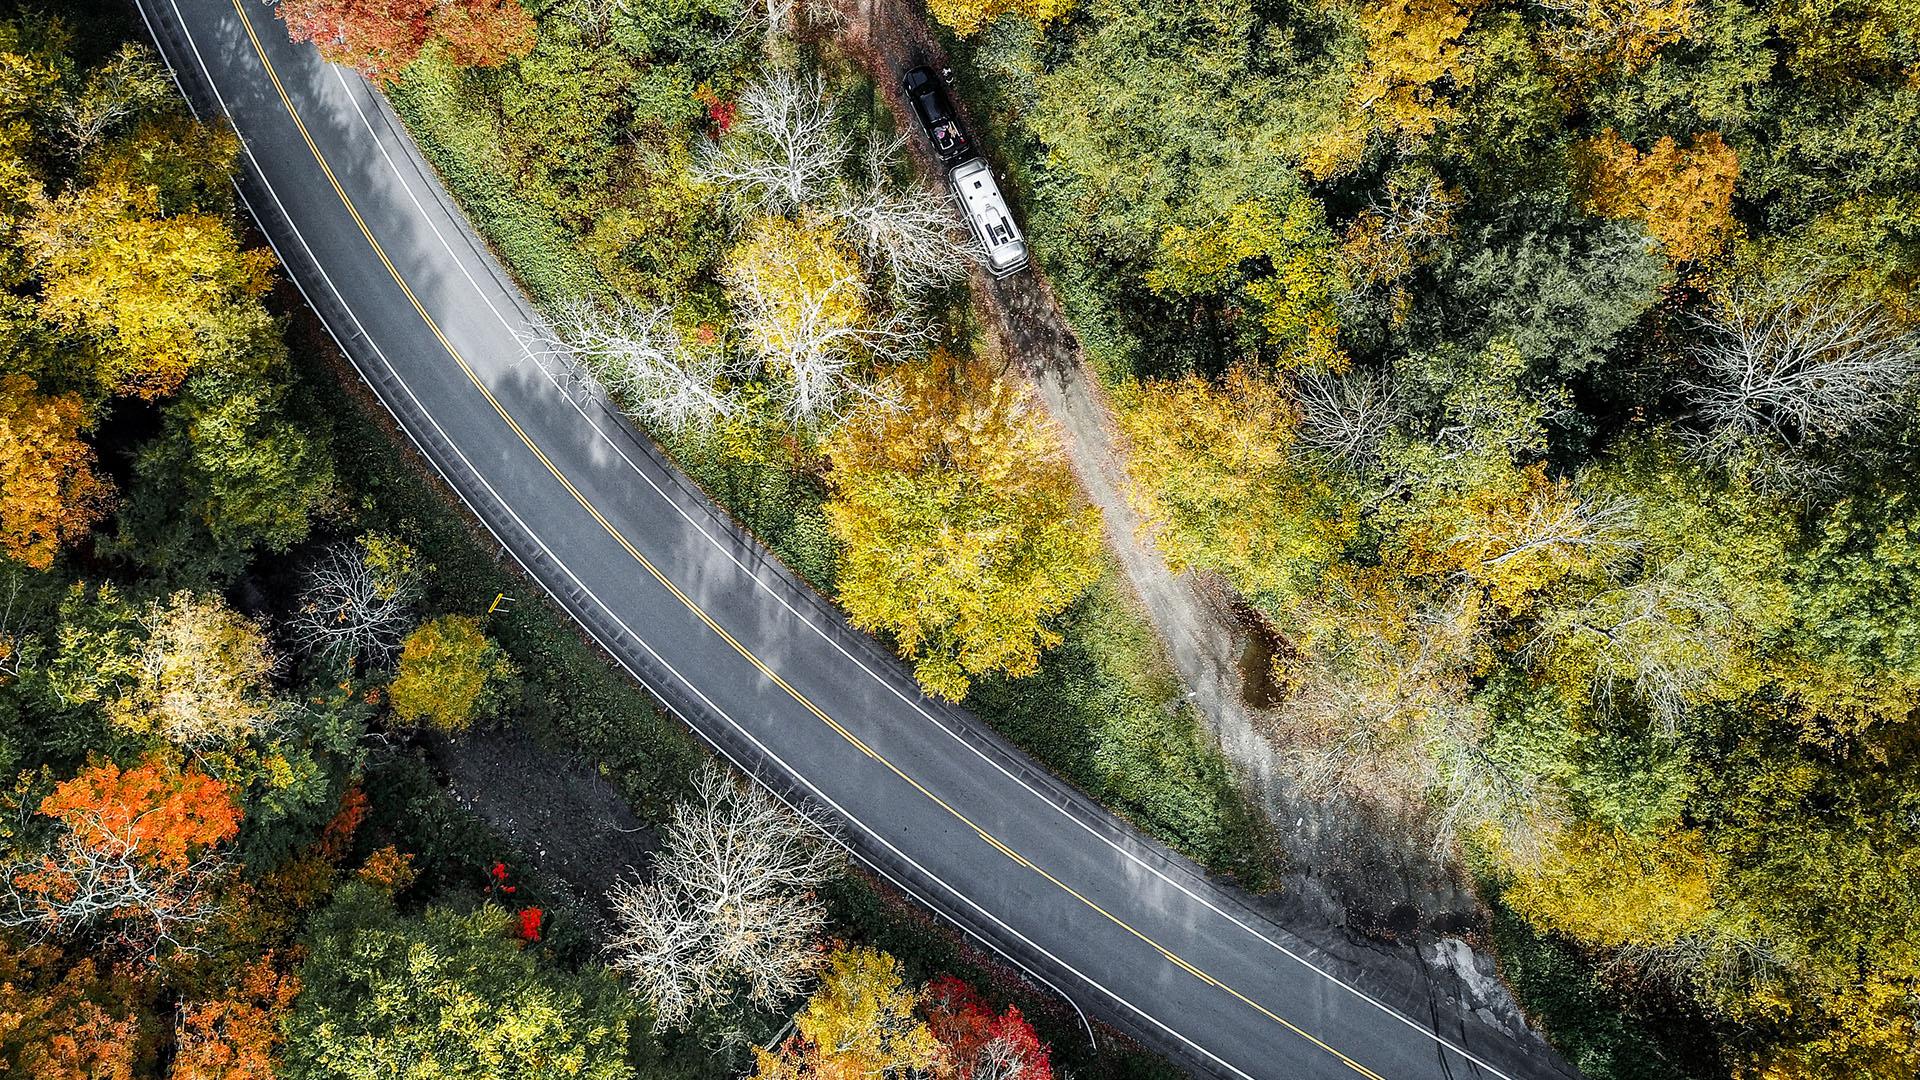 airstream fall foliage camping 2021 _0005_LUVLENS_COMMERCIAL_AIRSTREAMFALLVTFOLIAGE_WEEK2-5